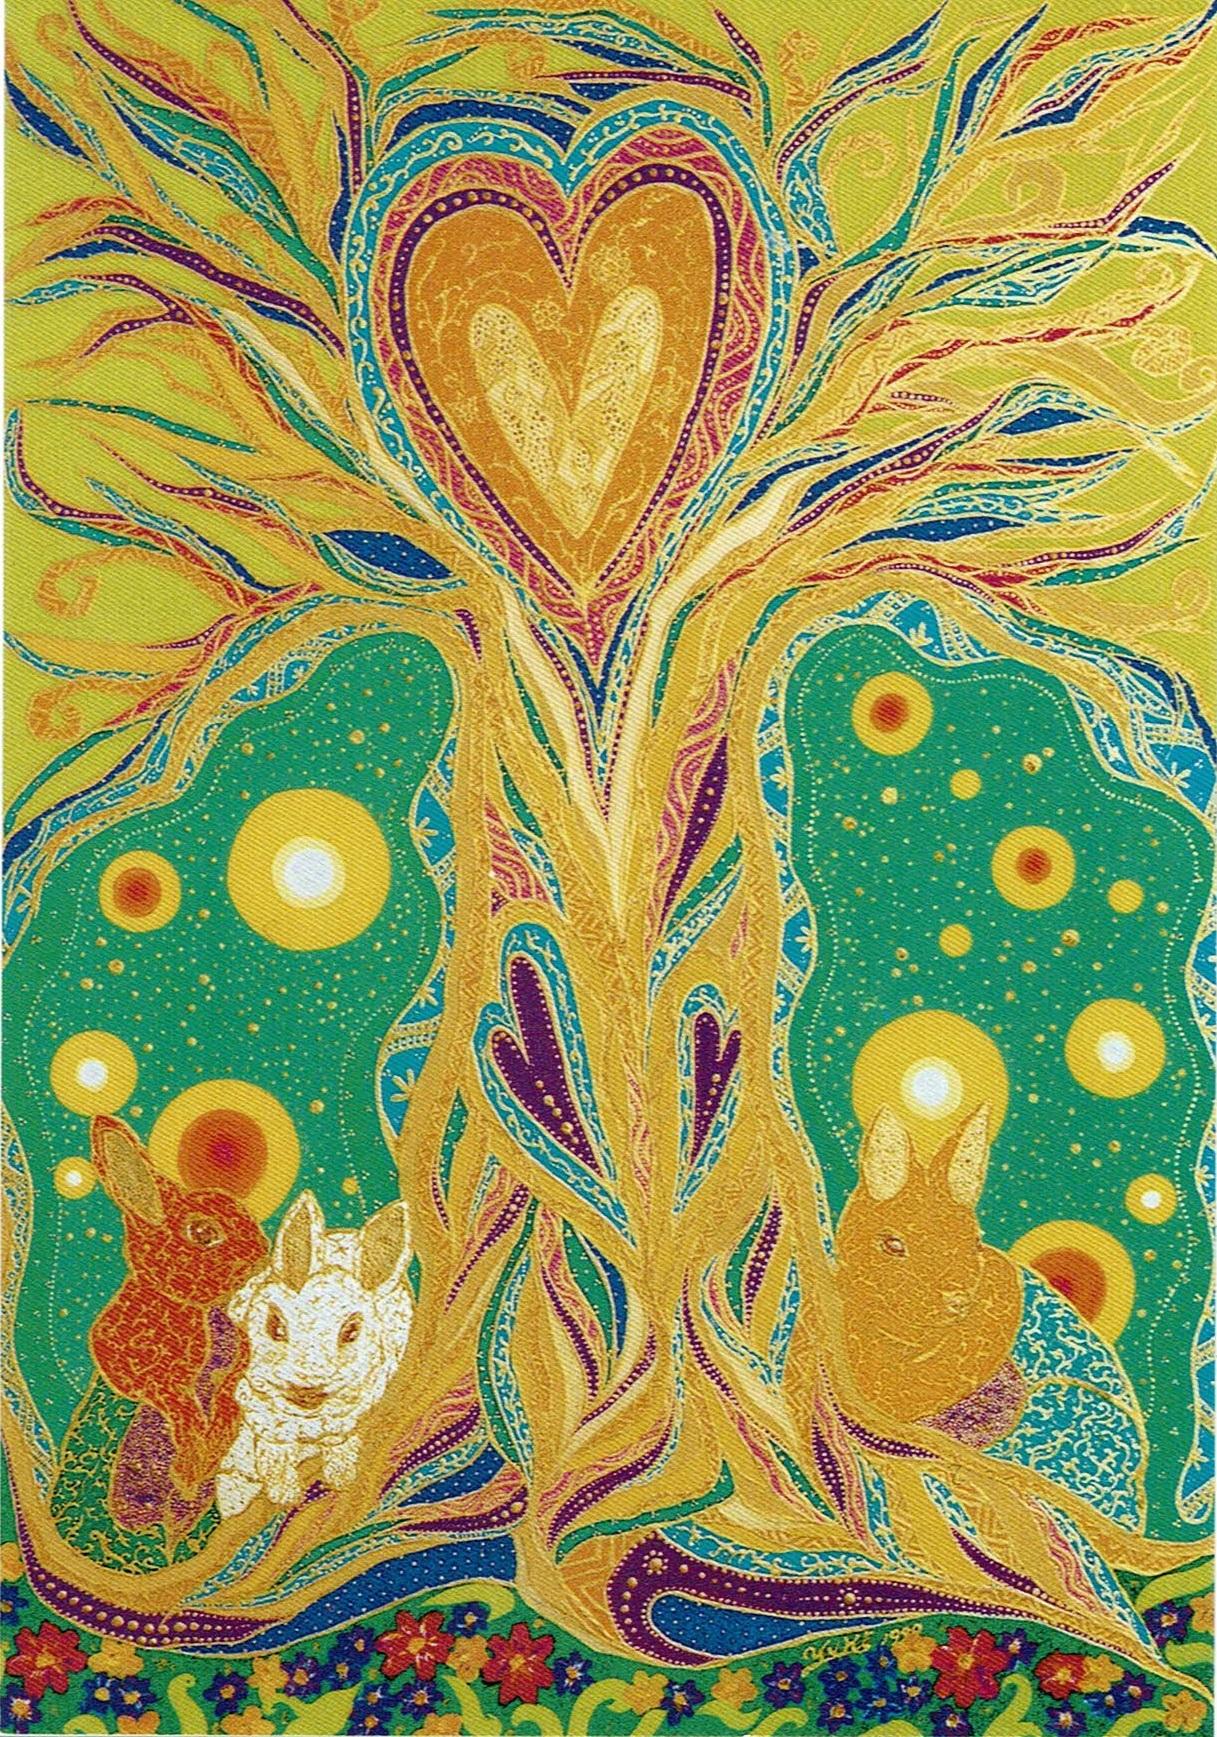 ⑧ Mother Tree 裏に日本語詩入り Japanese Poem on Back side